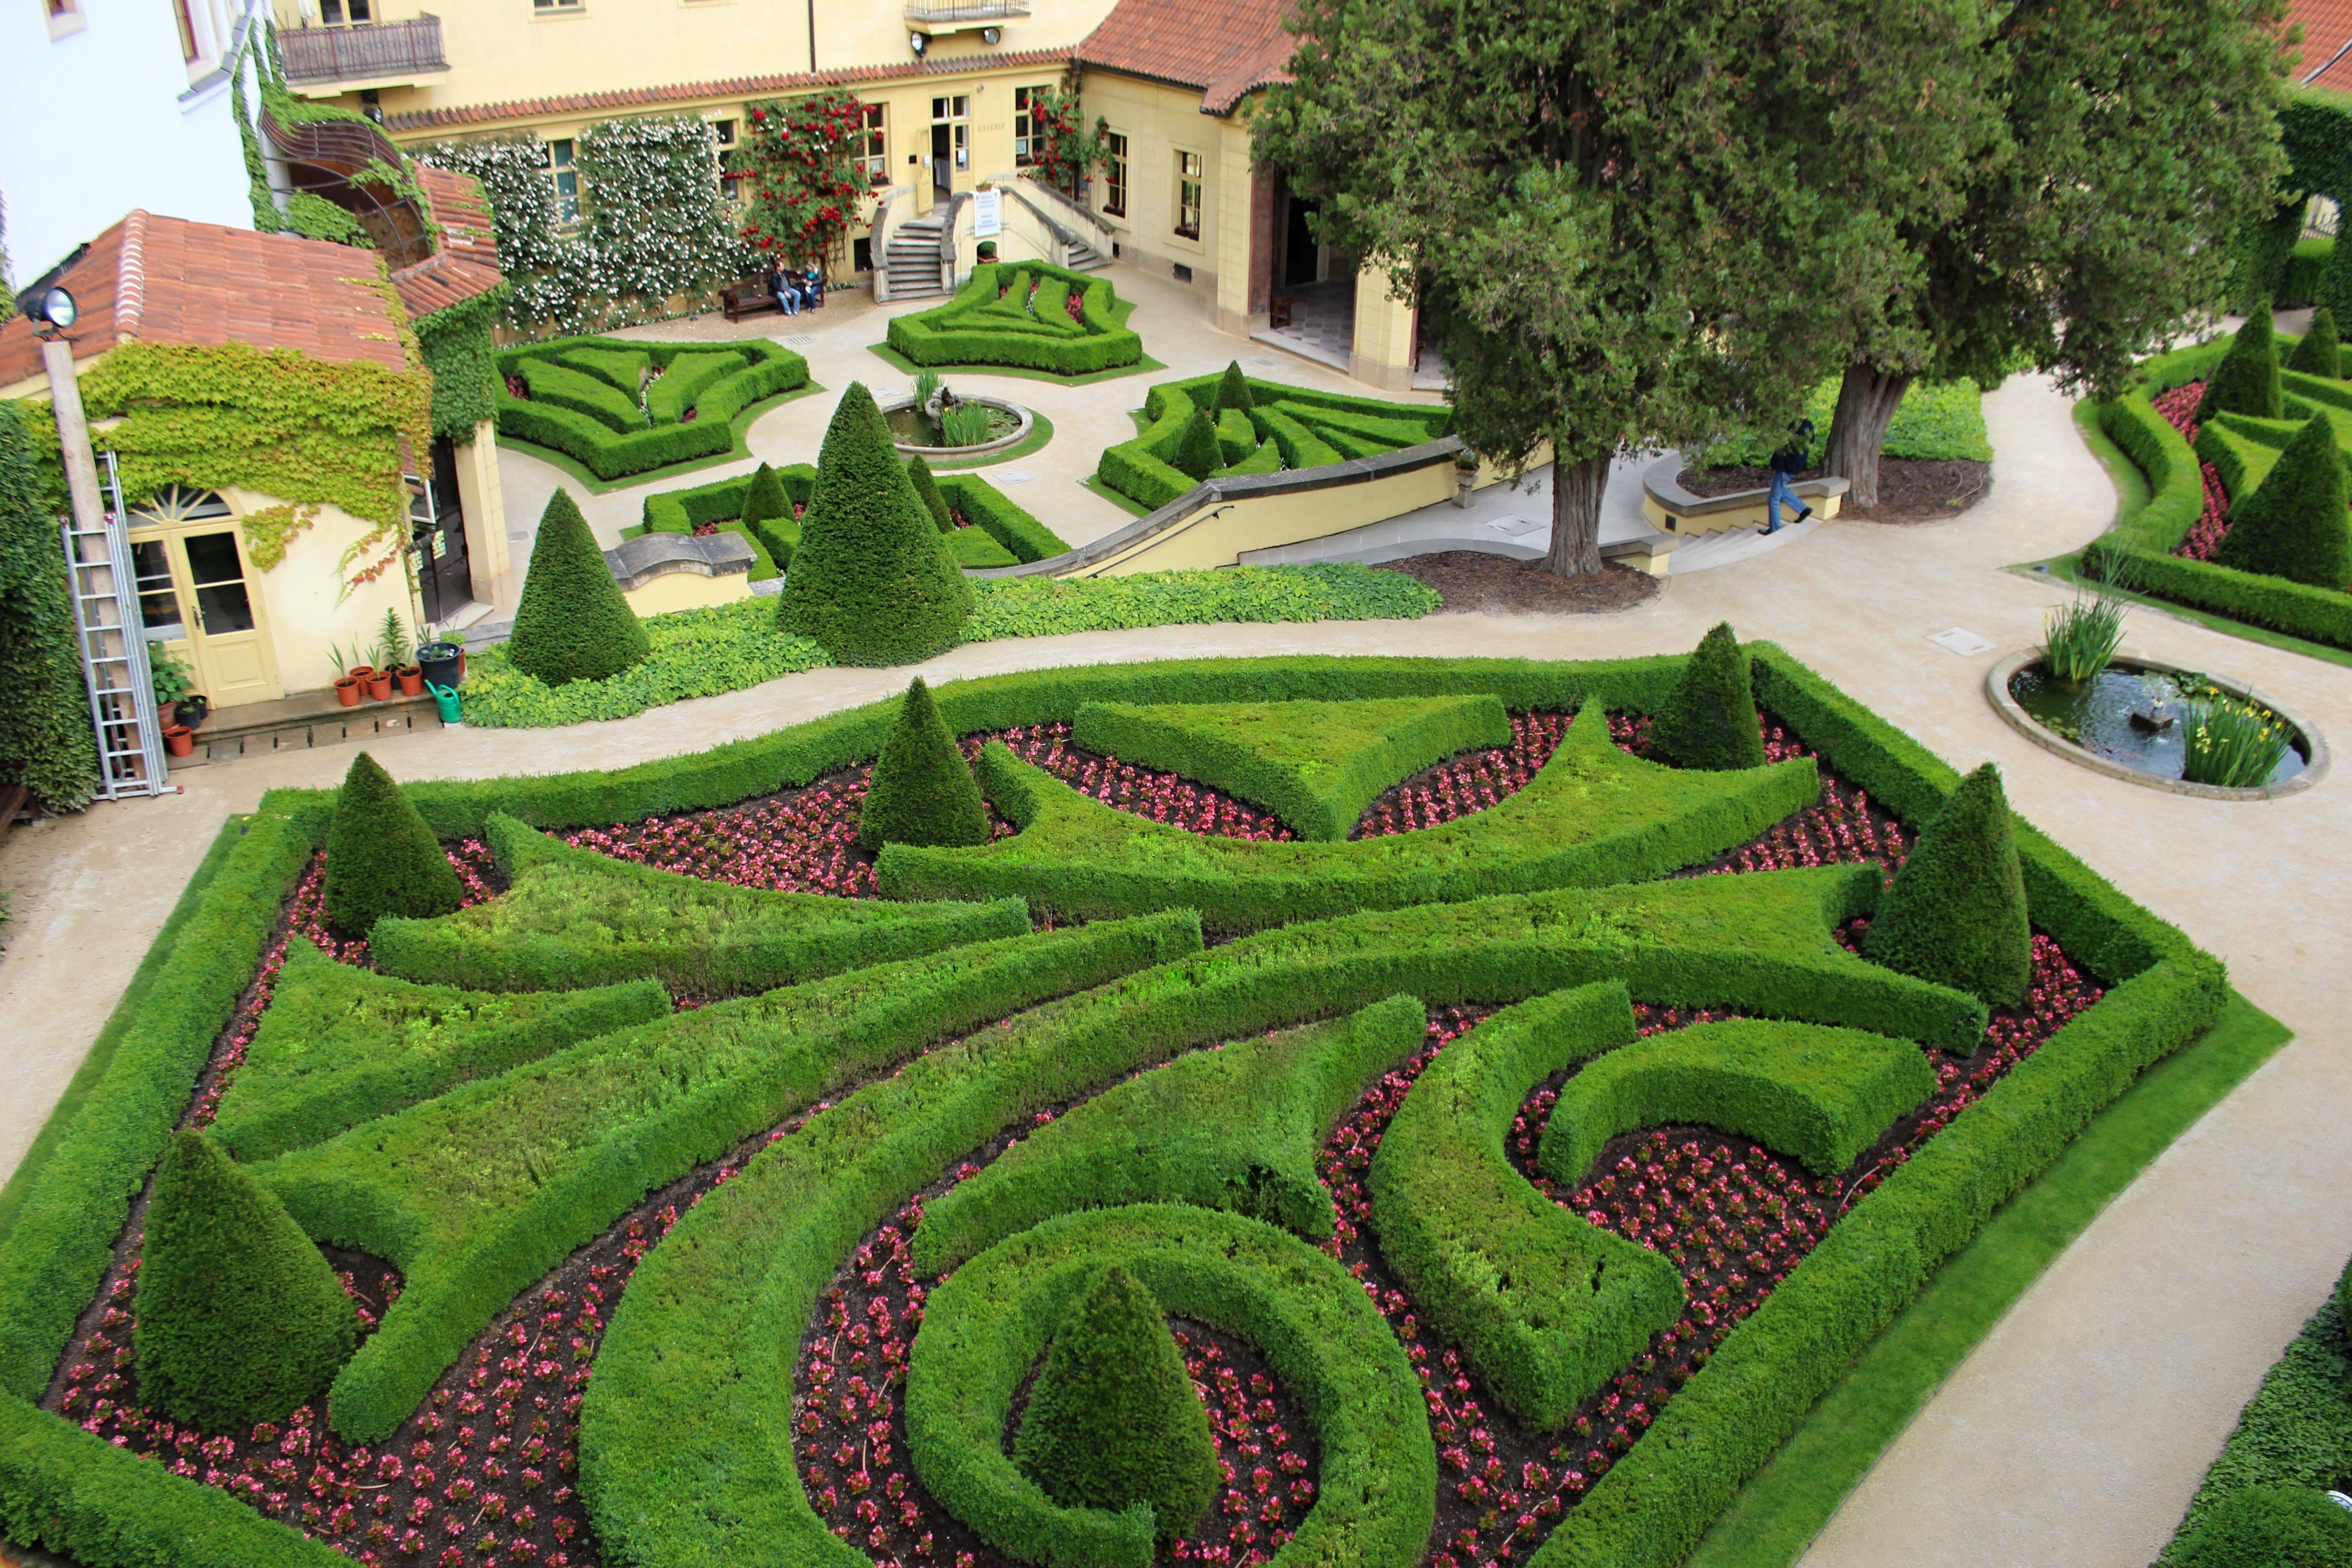 Free Images Nature Grass Lawn Green Park Prague Landscaping Courtyard Beauty Maze Botanical Garden Estate Yard Neighbourhood Urban Design Residential Area Outdoor Structure Landscape Architect 5184x3456 492632 Free Stock Photos